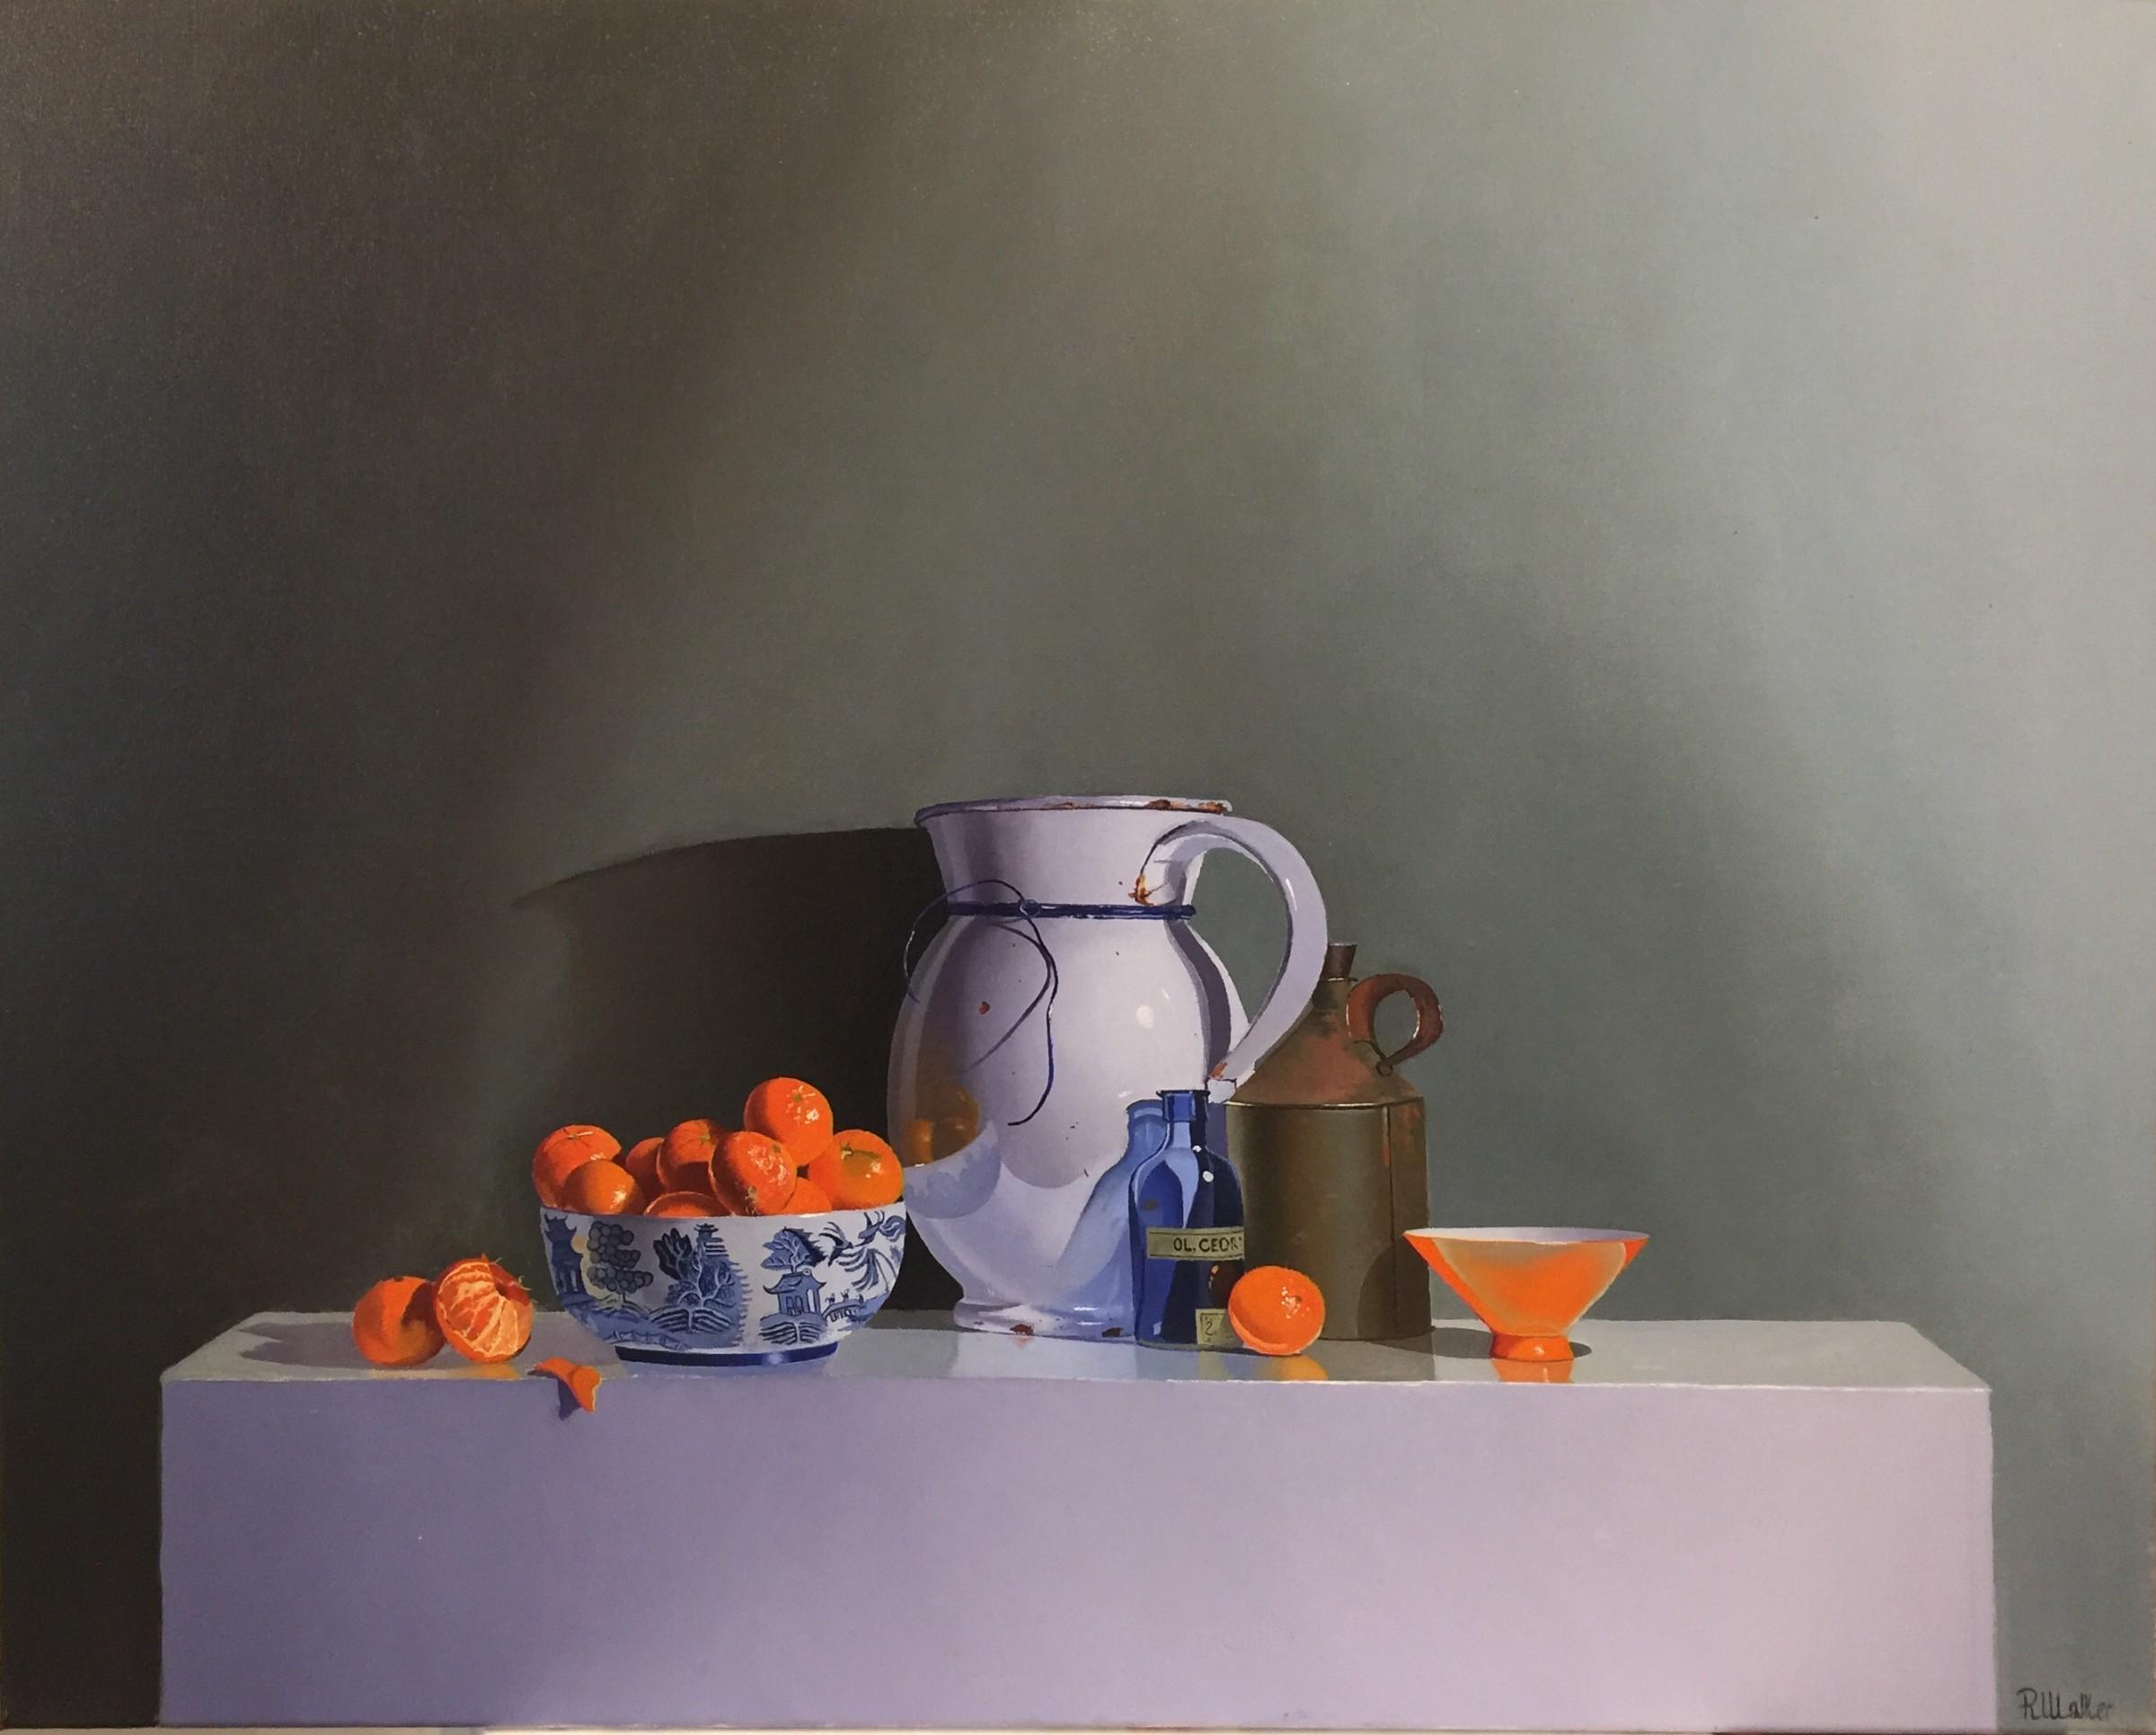 <span class=&#34;link fancybox-details-link&#34;><a href=&#34;/artists/67-robert-walker/works/1950-robert-walker-blue-glass-bottle-with-clementines/&#34;>View Detail Page</a></span><div class=&#34;artist&#34;><strong>Robert Walker</strong></div> <div class=&#34;title&#34;><em>Blue Glass Bottle with Clementines</em></div> <div class=&#34;medium&#34;>Oil on Linen </div> <div class=&#34;dimensions&#34;>64 x 79 cm</div><div class=&#34;copyright_line&#34;>Copyright The Artist</div>